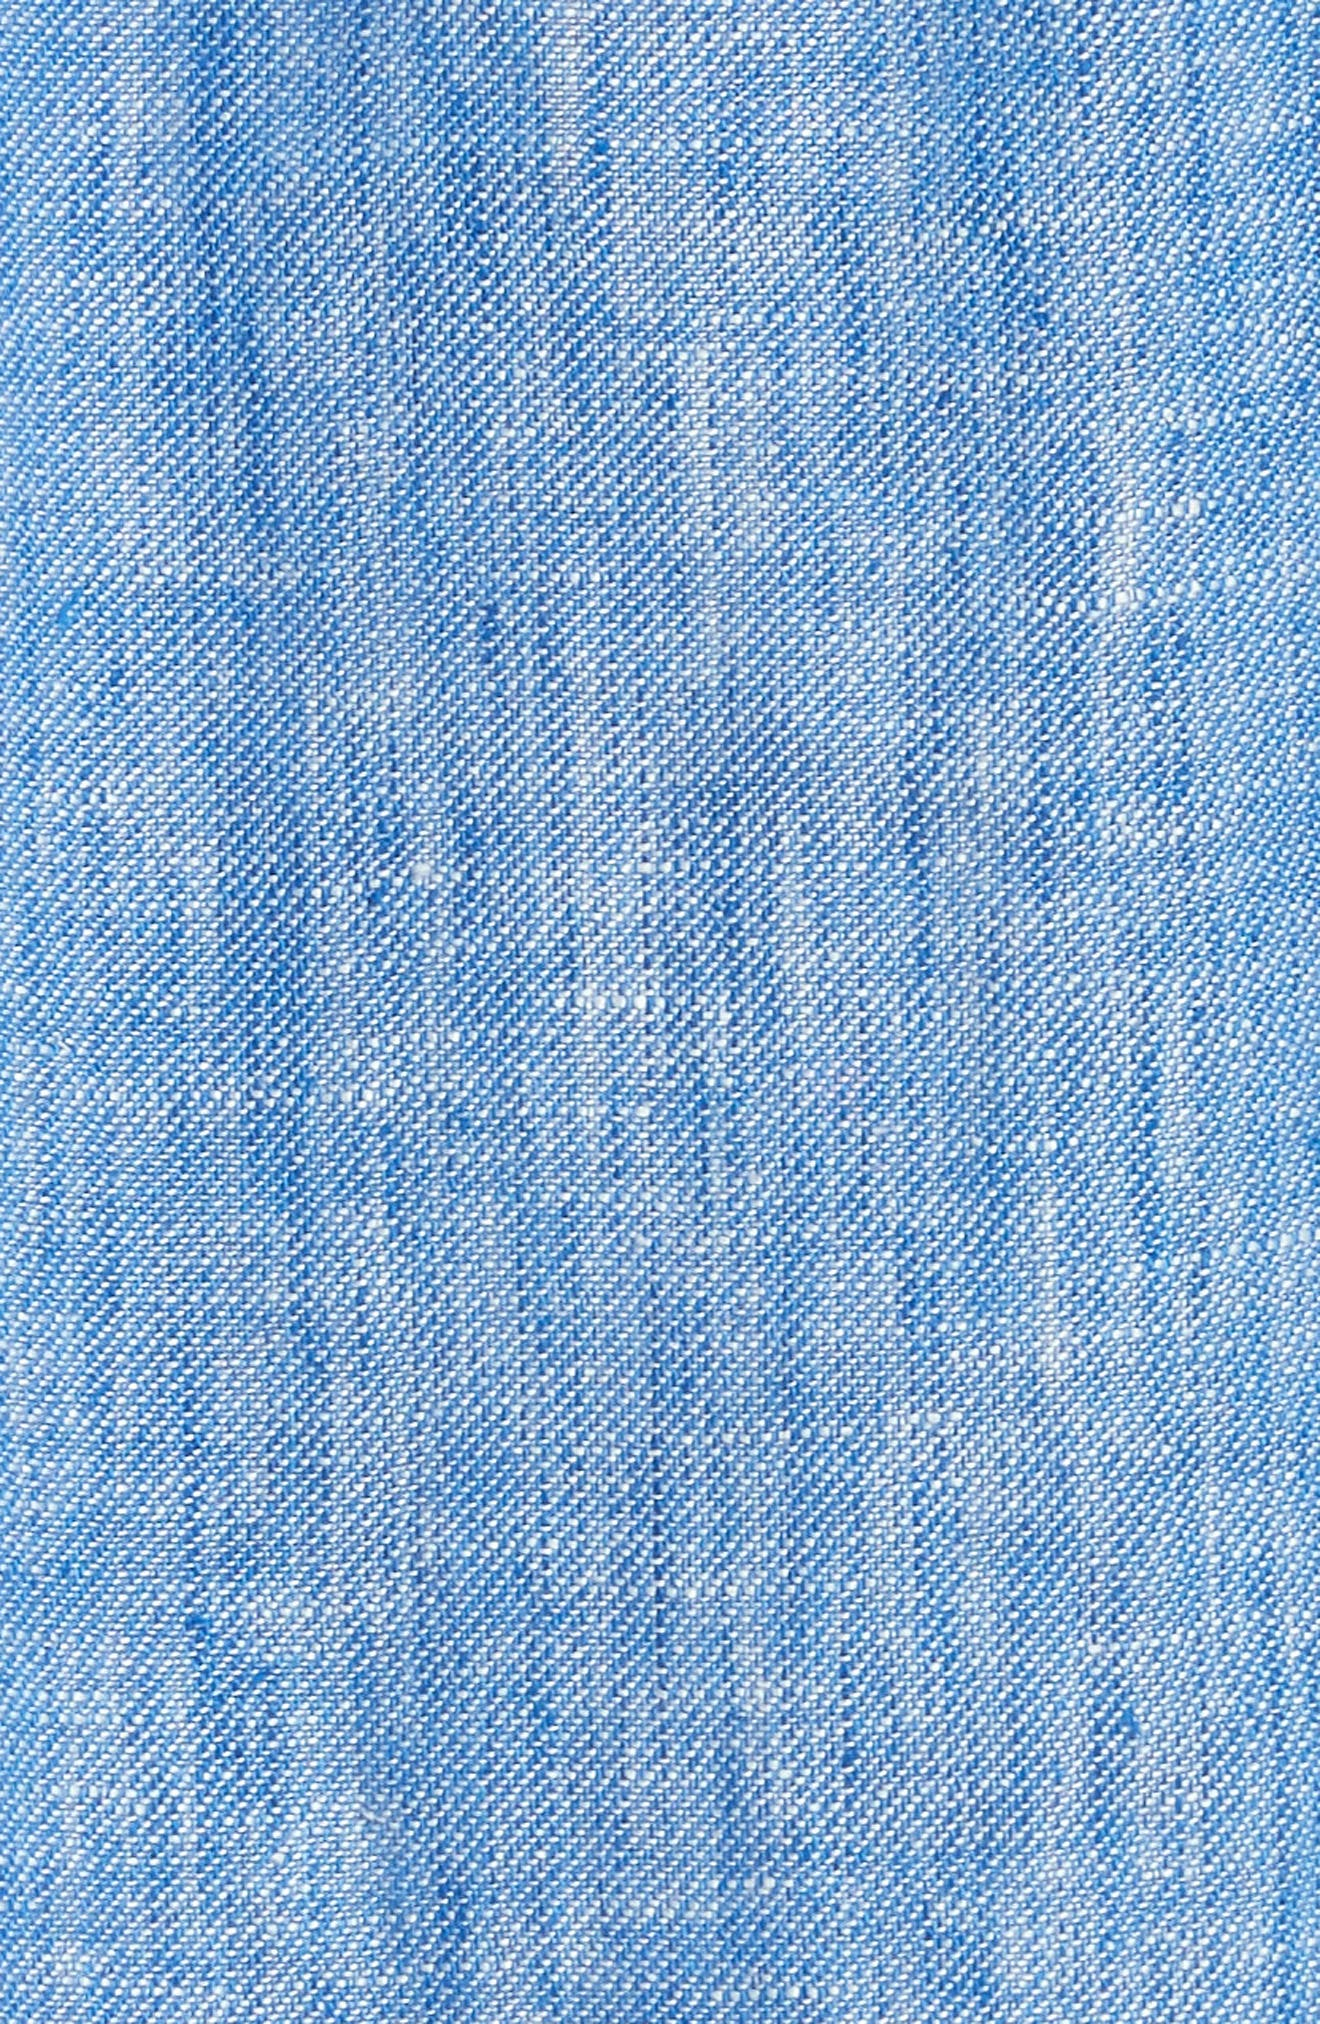 Fermina Ruffle Sleeve Linen Dress,                             Alternate thumbnail 5, color,                             Surf Break